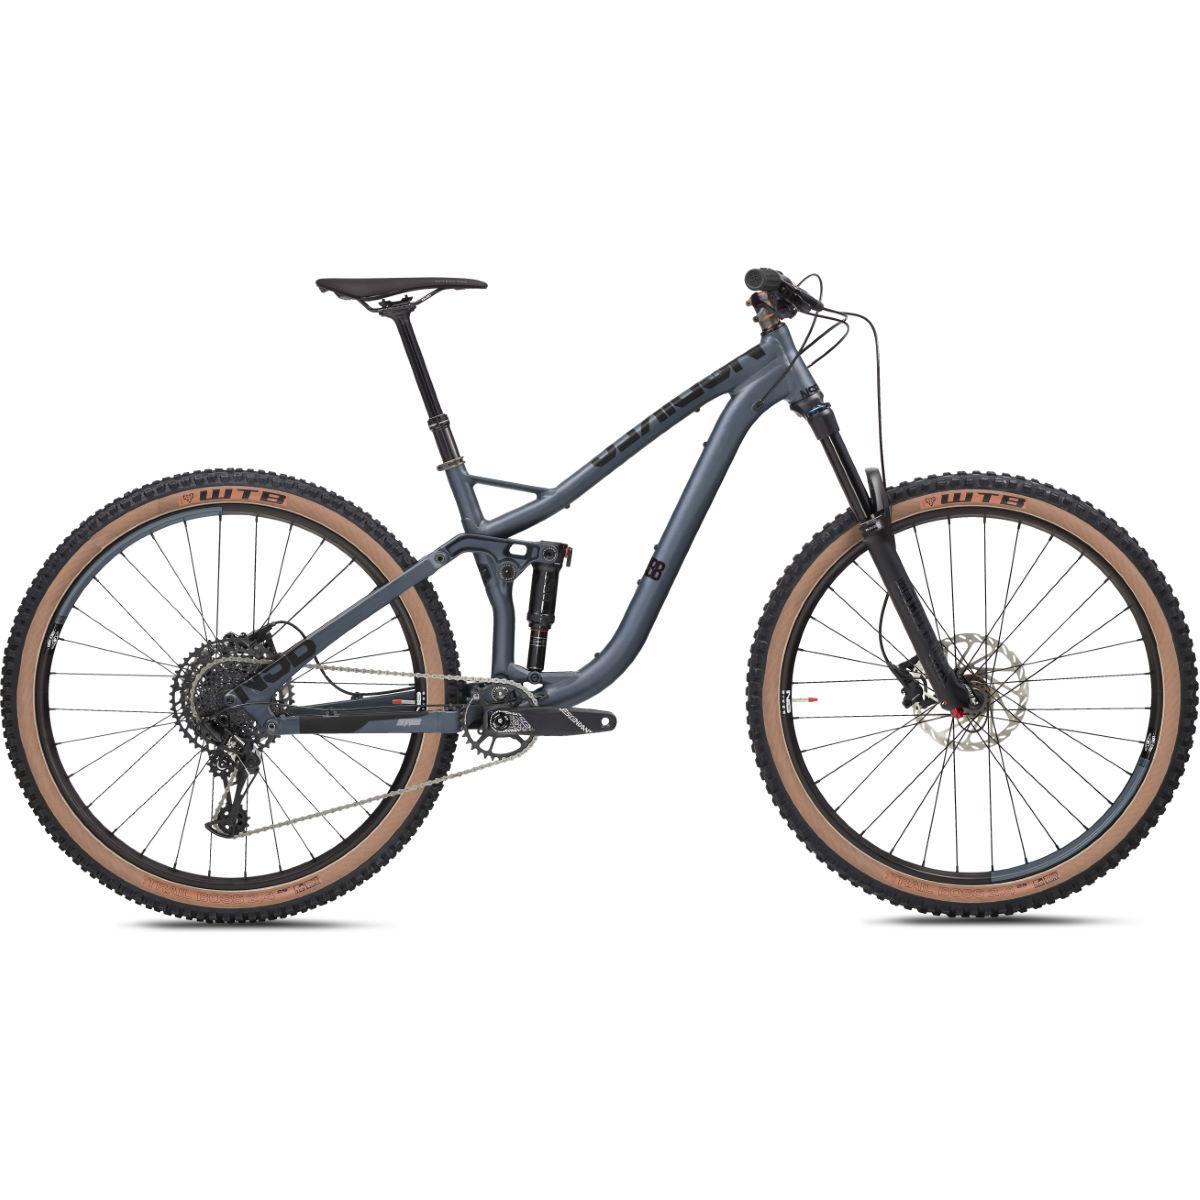 NS Bikes Snabb 150 2020 Full